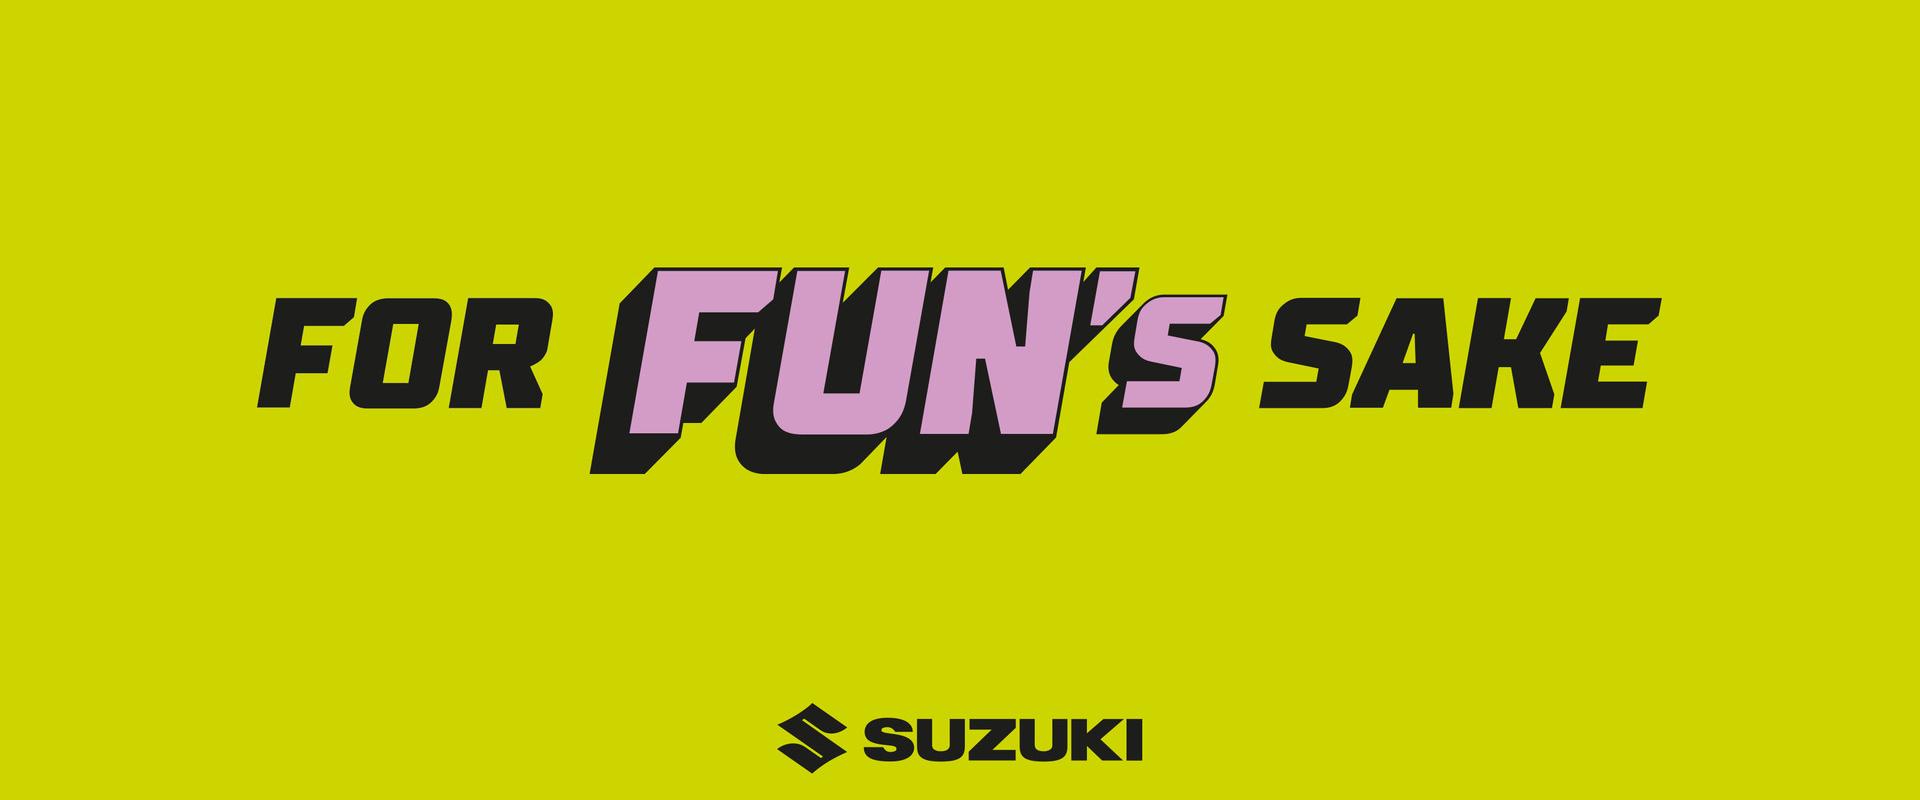 GardnerSuzuki-Forfunsakepurp